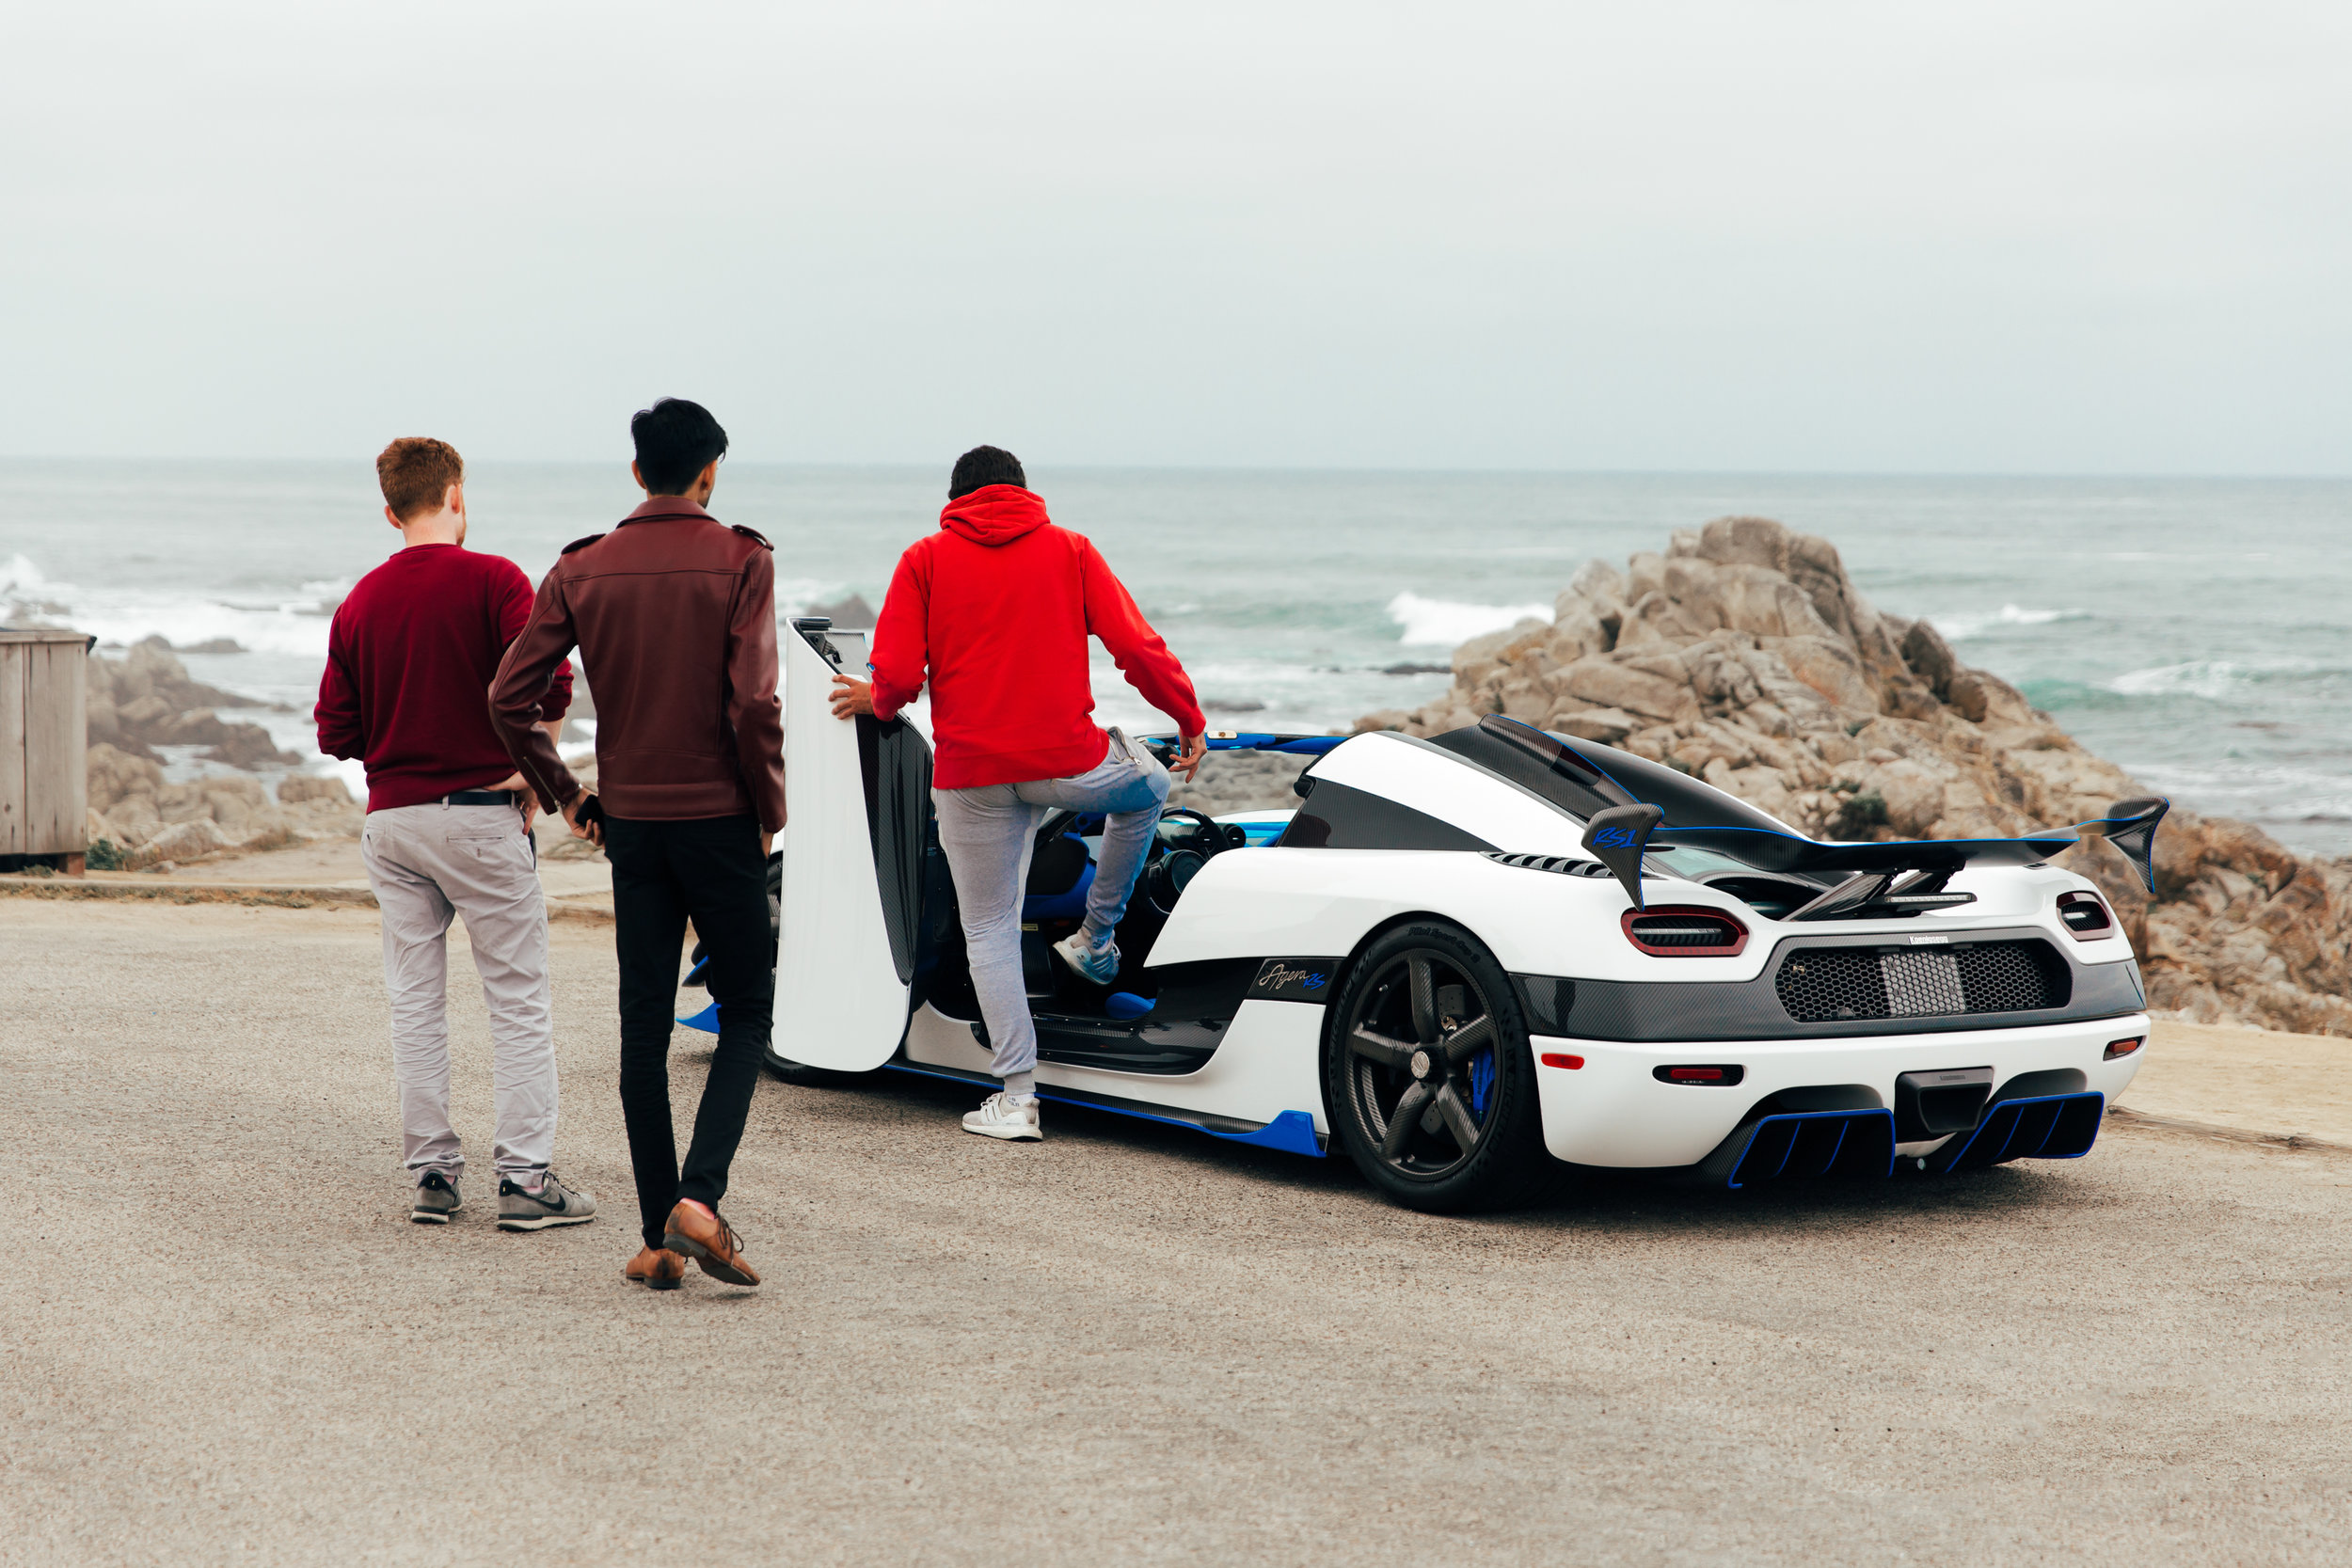 Stay_Driven_Monterey_Car_Week_Whitesse_Koenigsegg-32.jpg